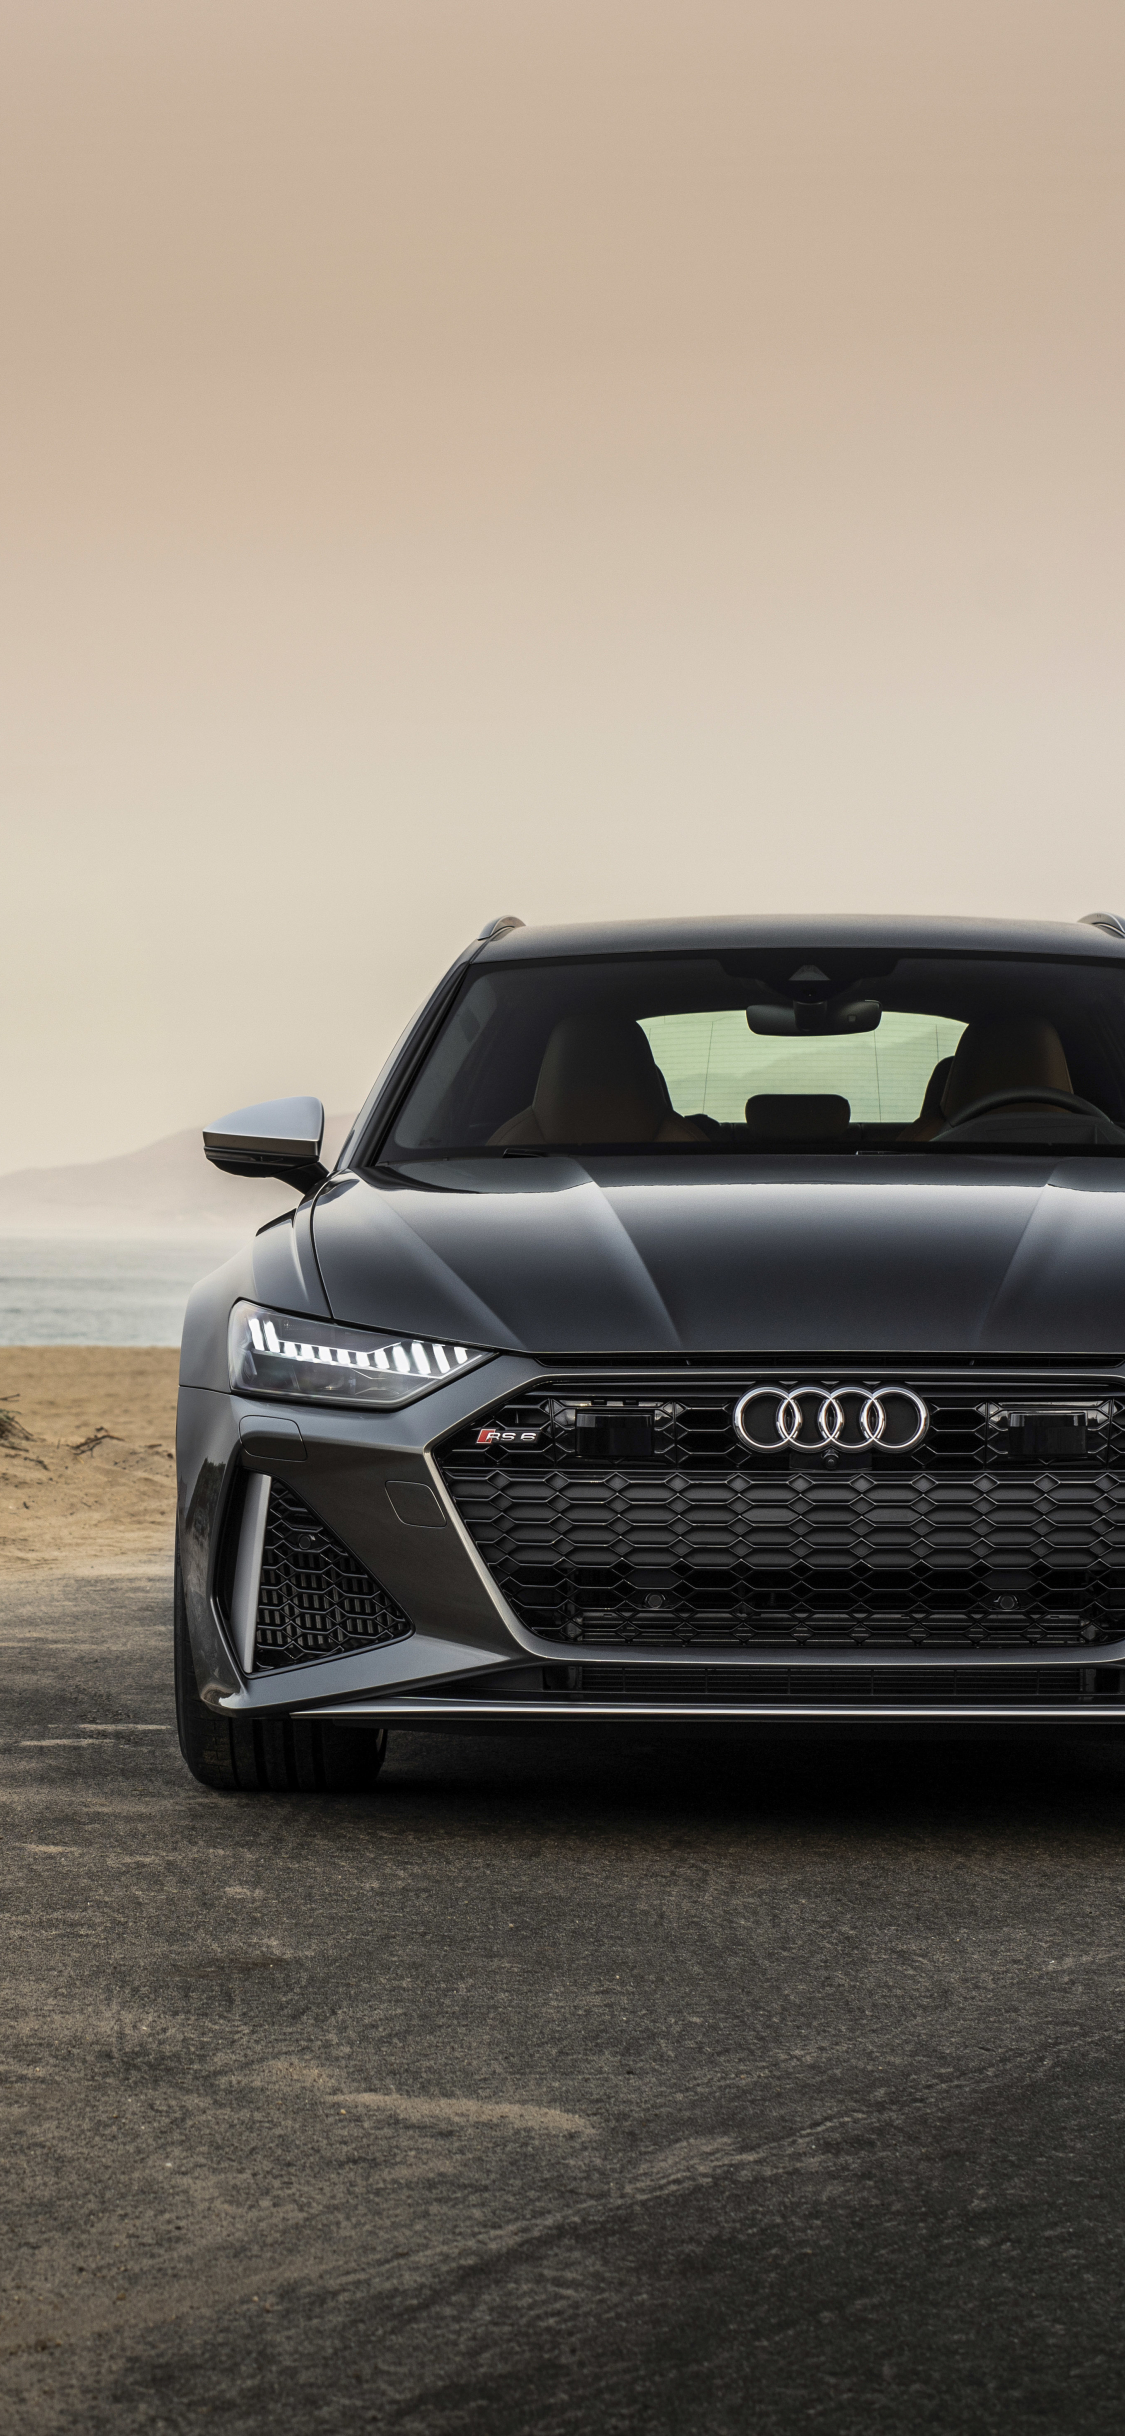 Audi RS6 Avant Mobile Wallpaper